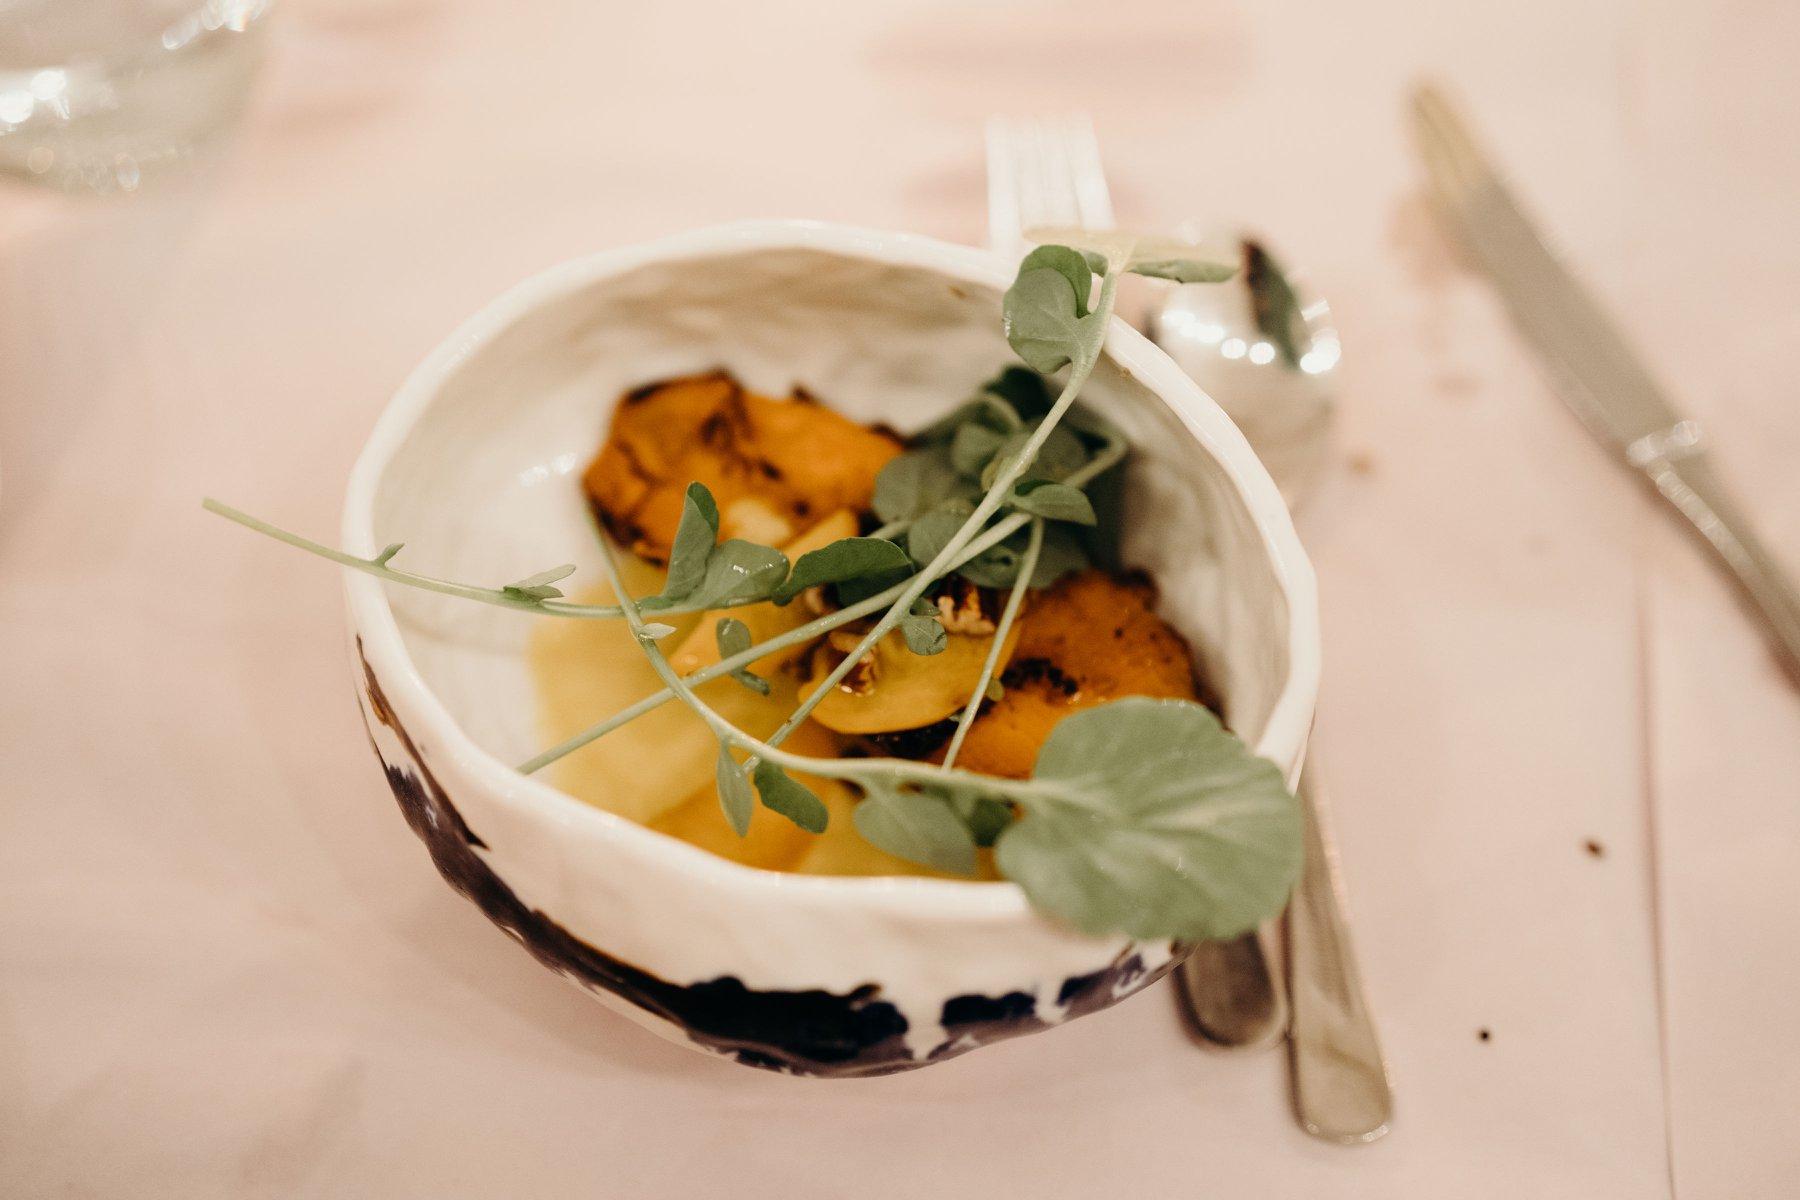 Kai! Served in Maia's ceramic bowl.